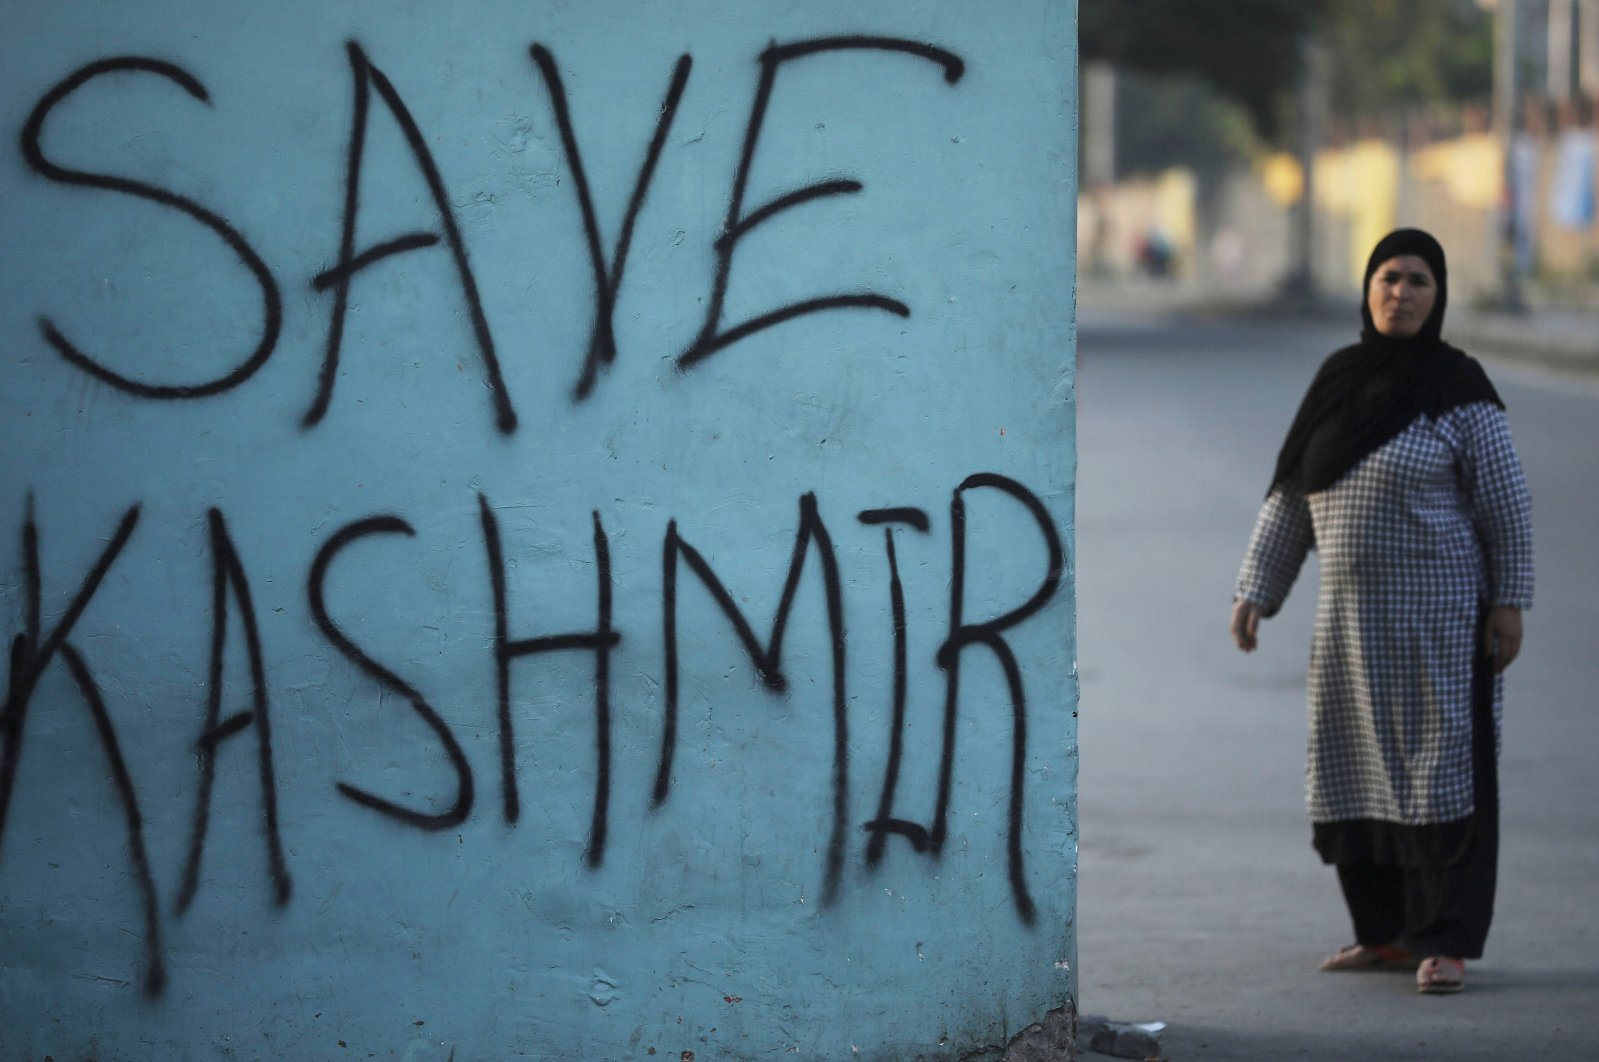 A Kashmiri woman stands next to a graffiti written on a wall during restrictions, Srinagar, Sept. 15, 2019. (REUTERS Photo)